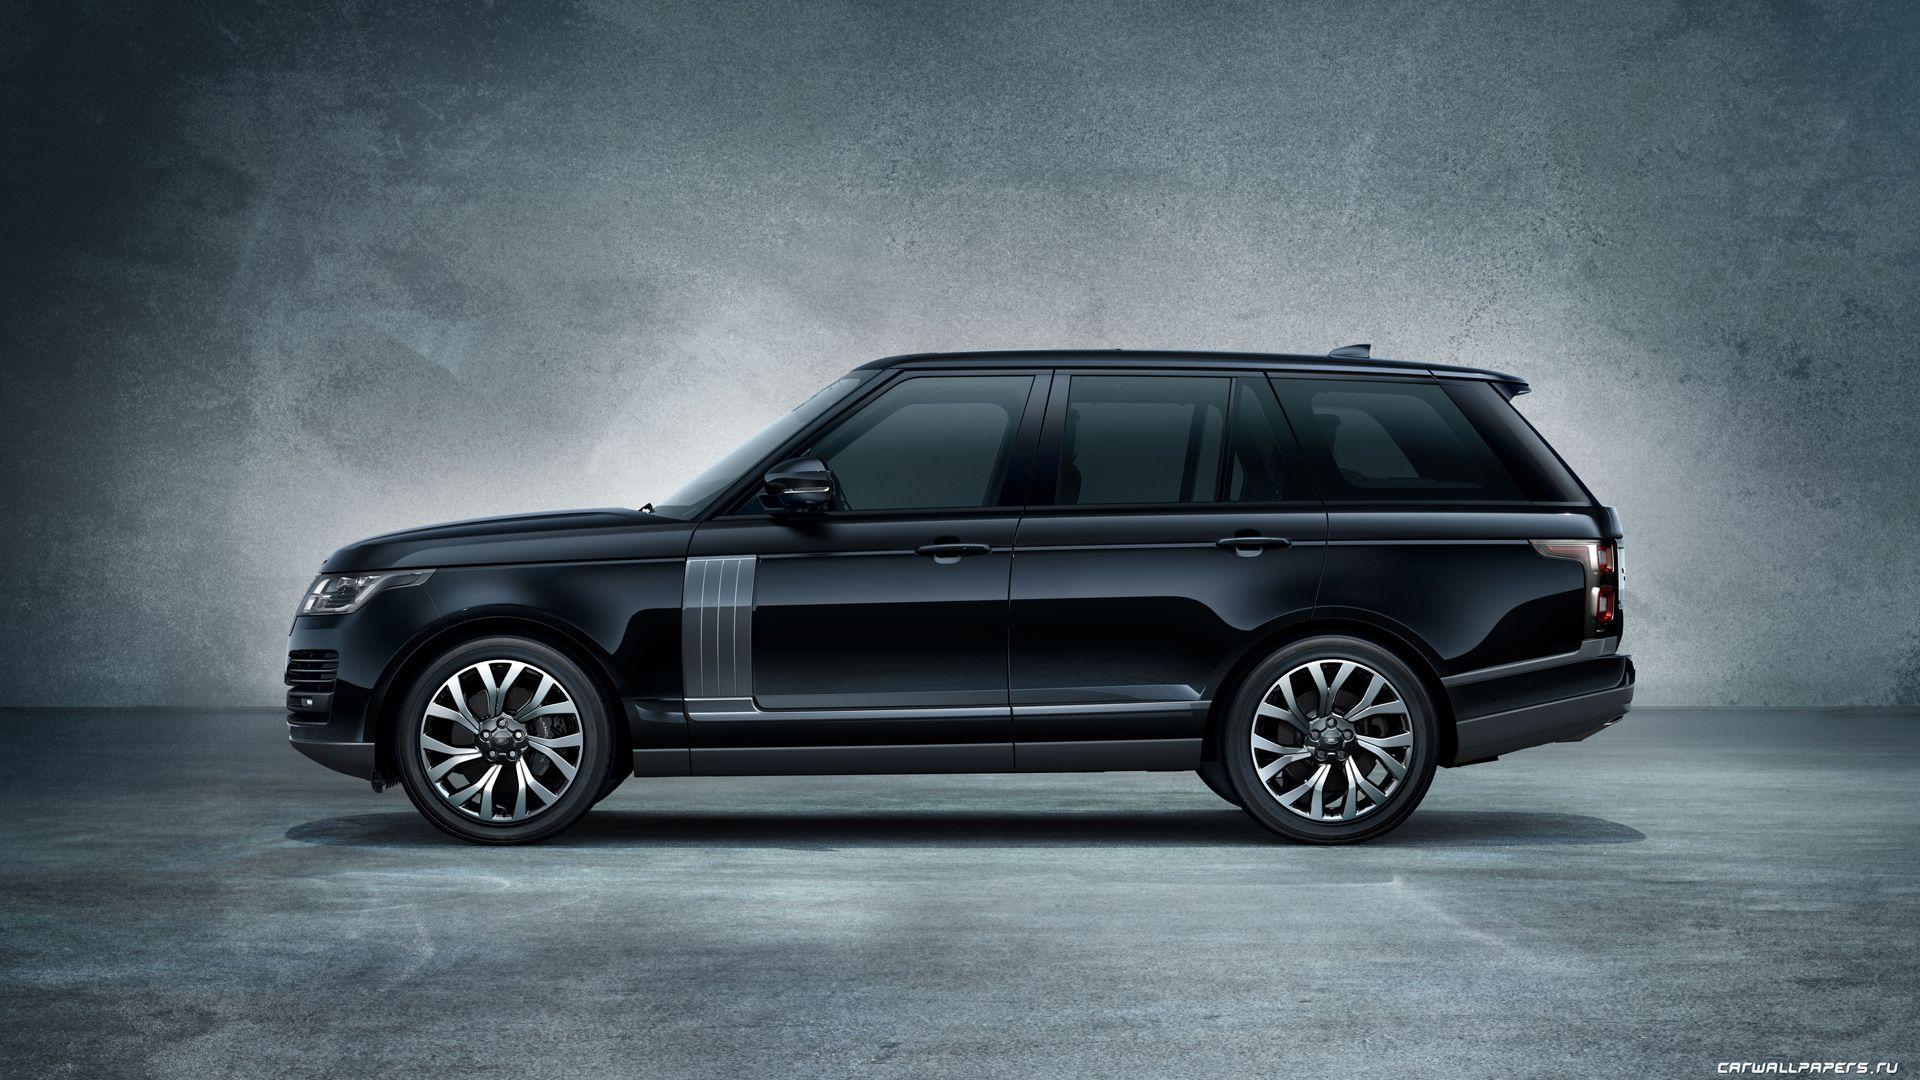 Range Rover 1080p background